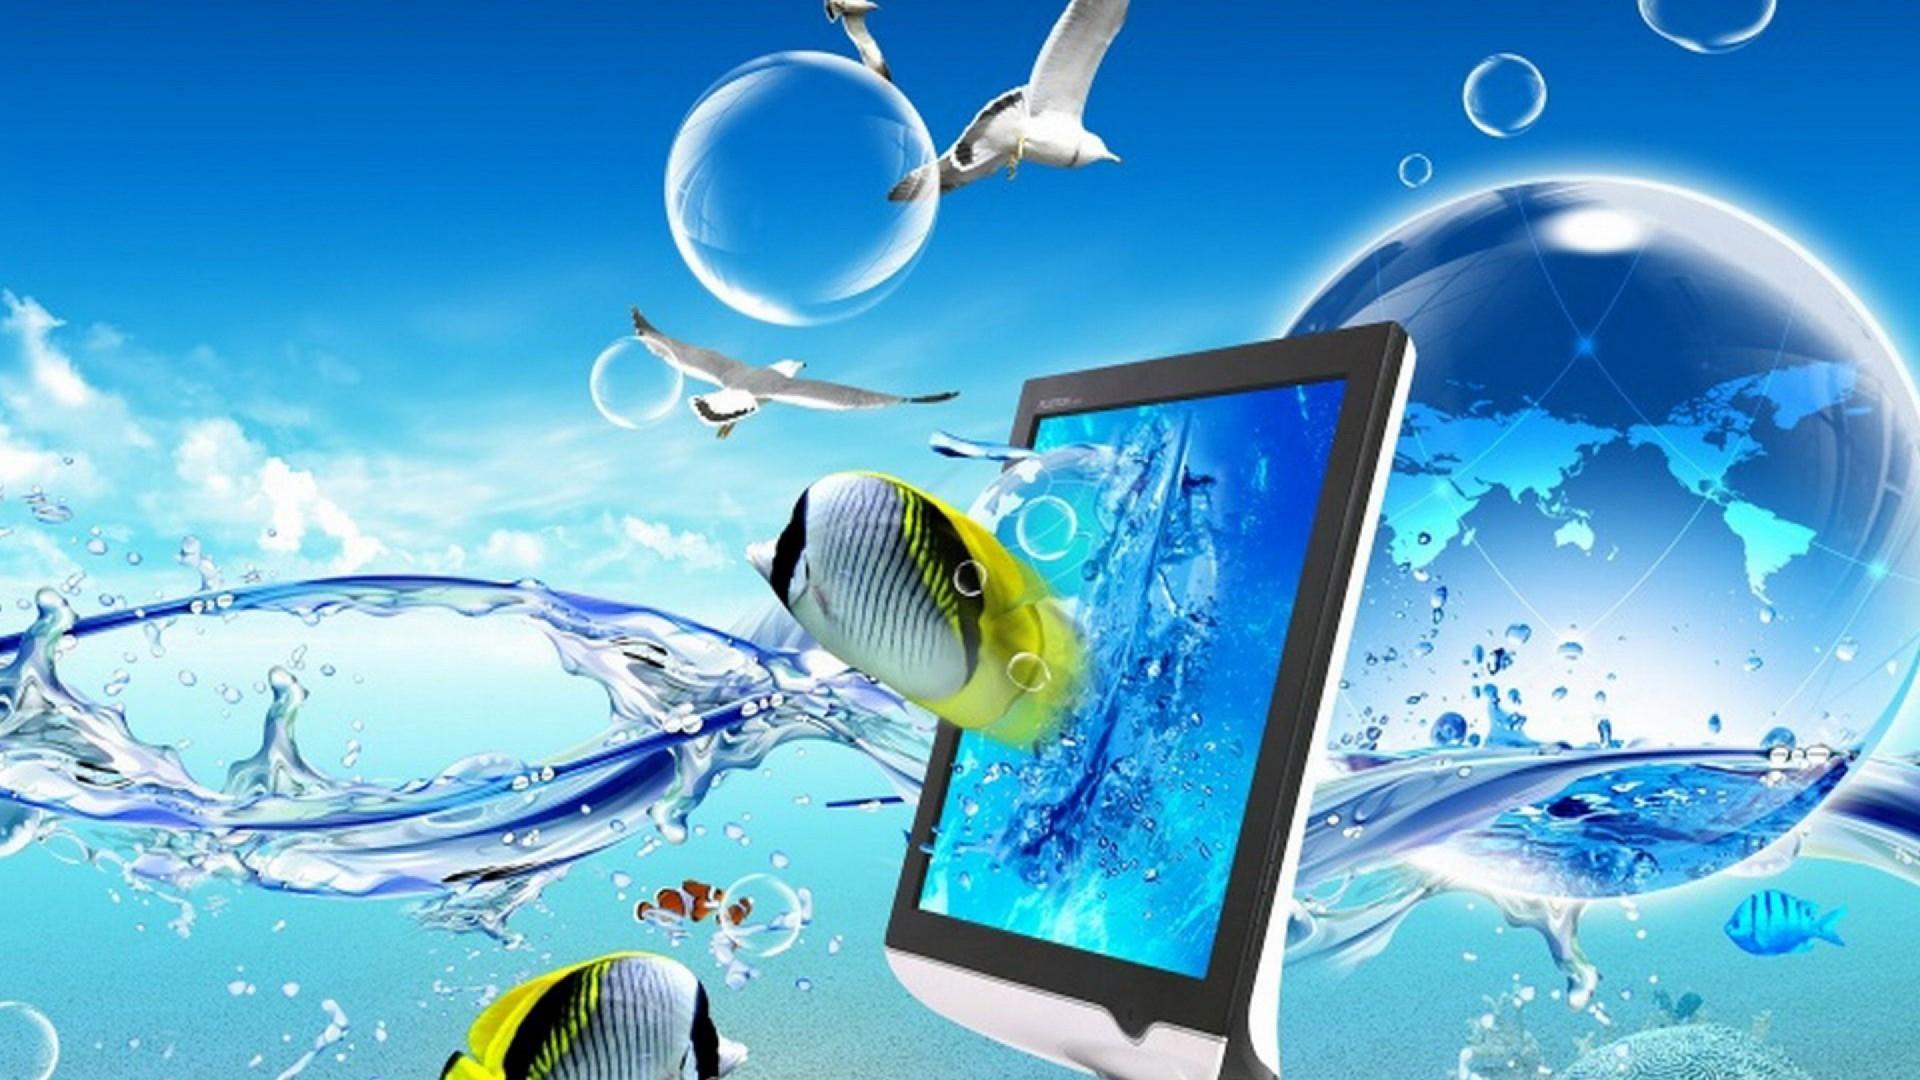 3d laptop images for desktop desktop wallpapers high .